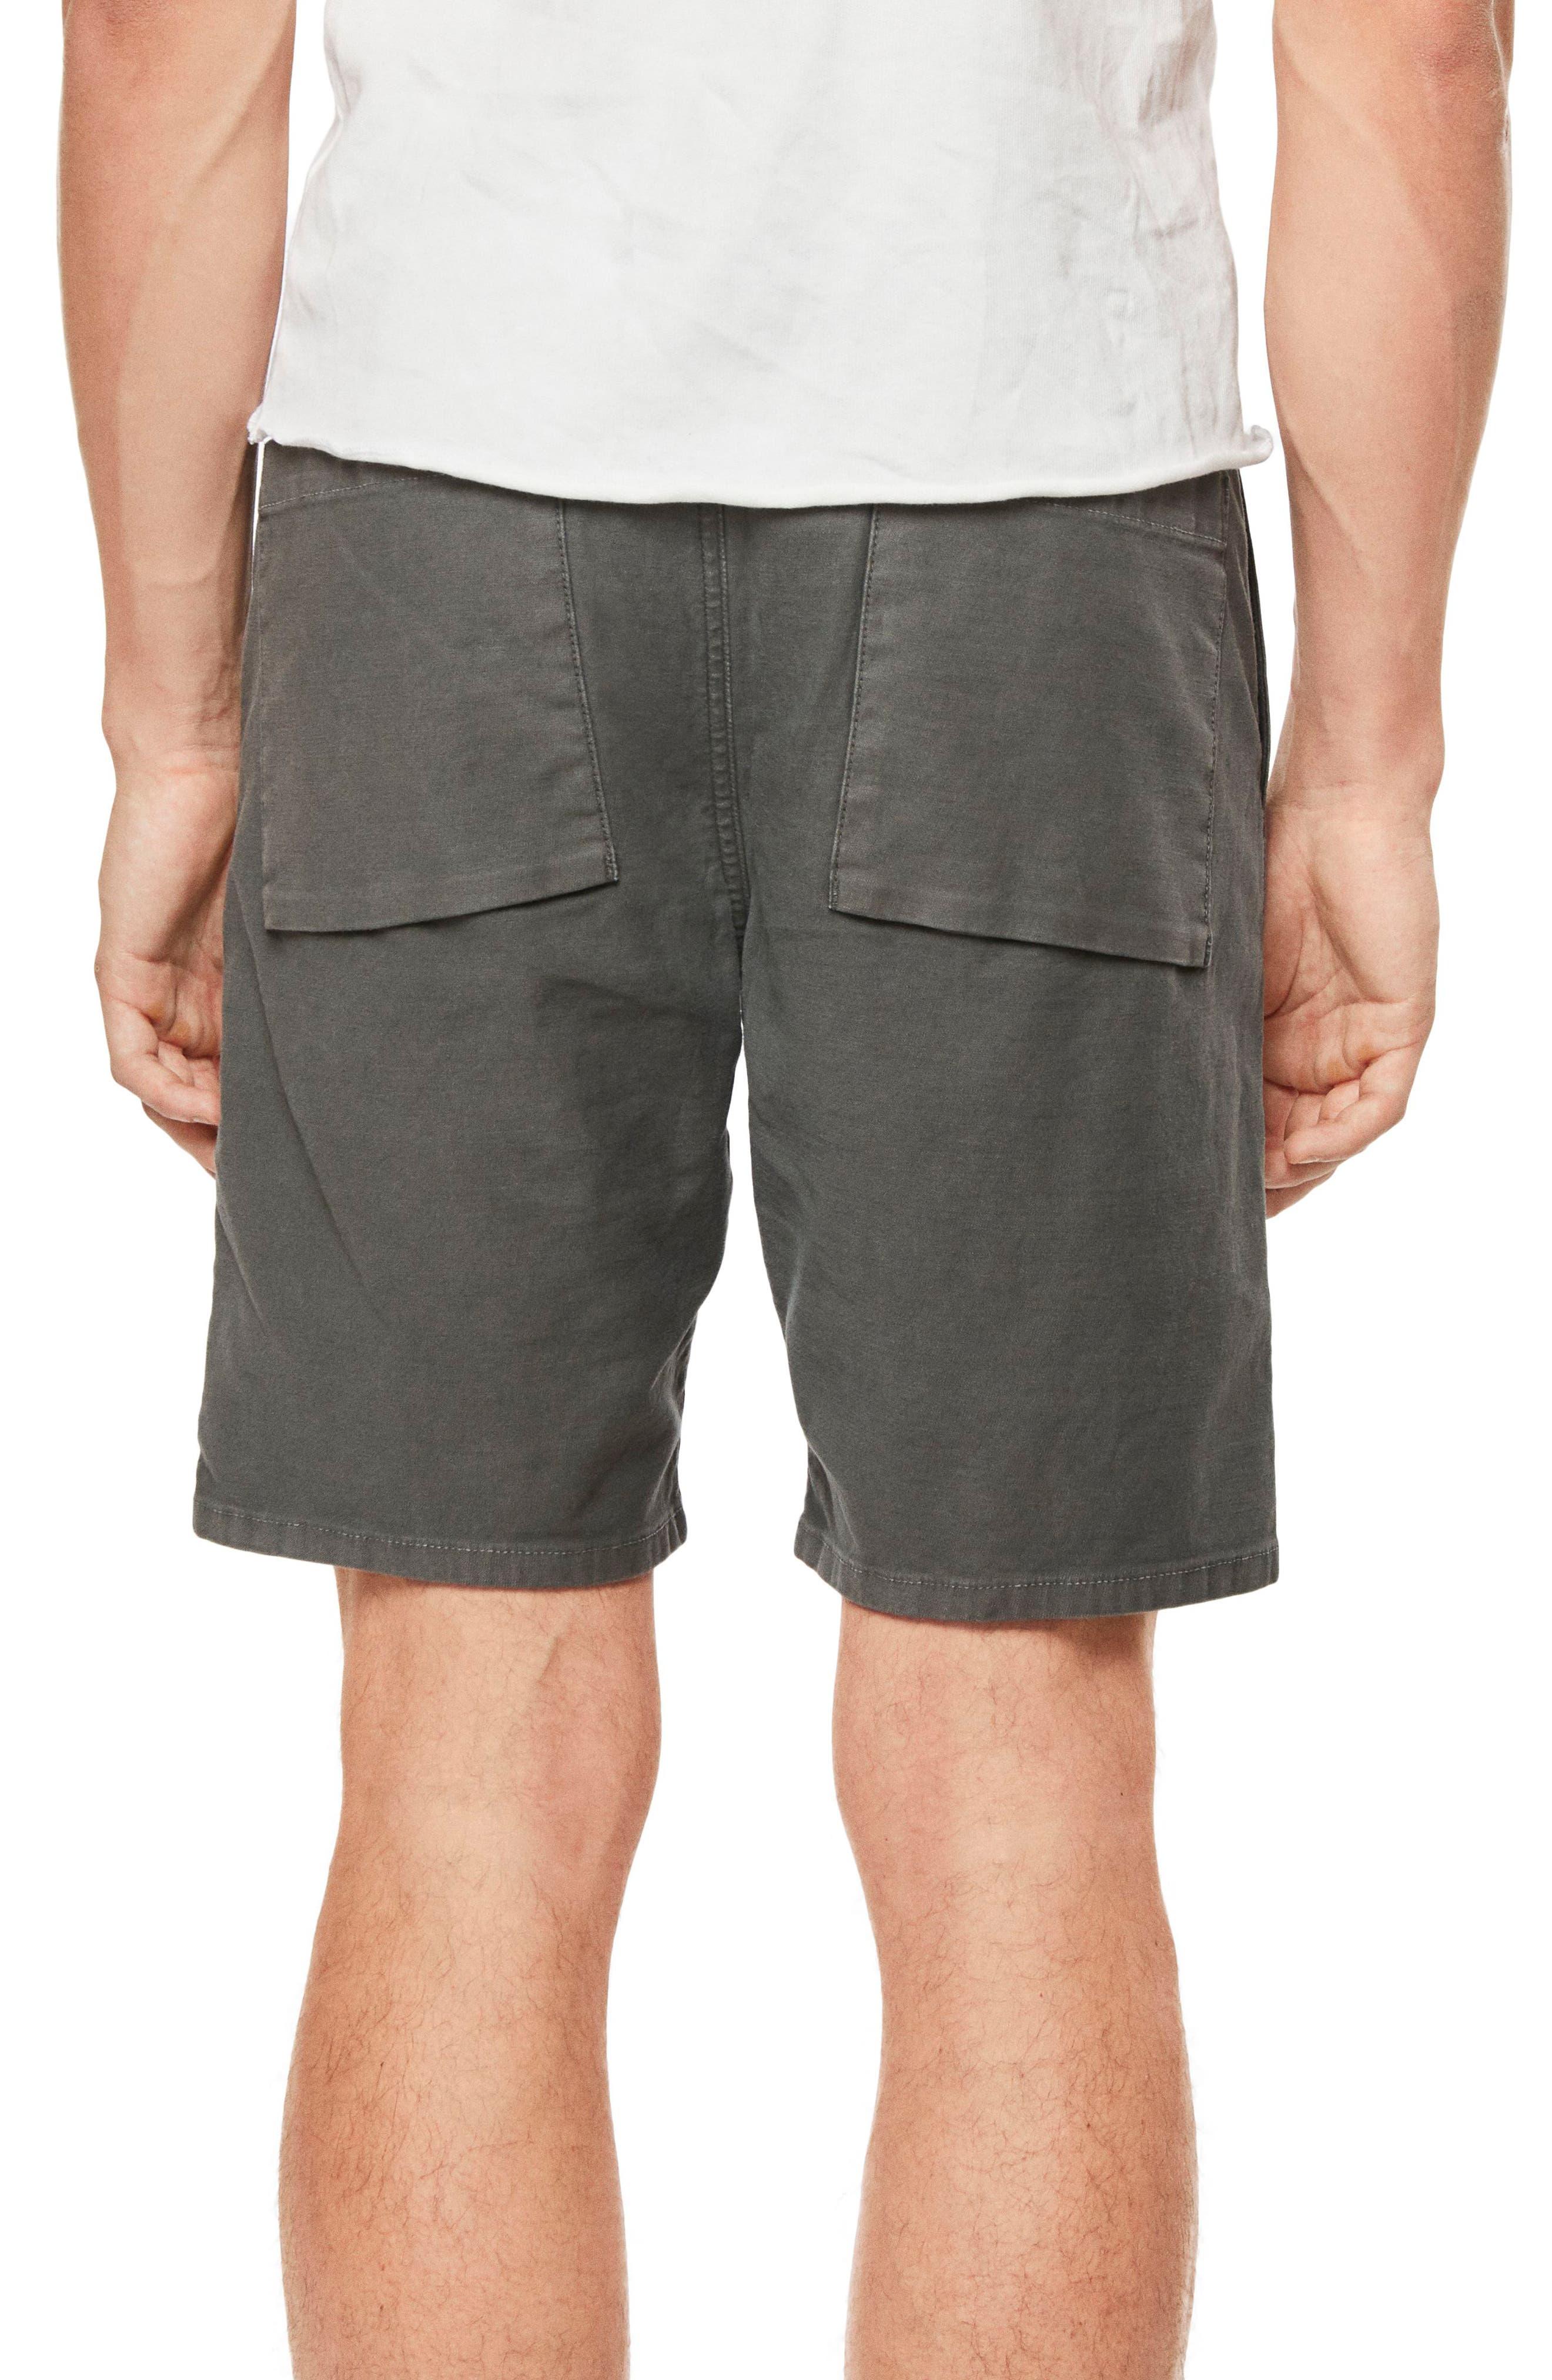 Kontact Shorts,                             Alternate thumbnail 2, color,                             308